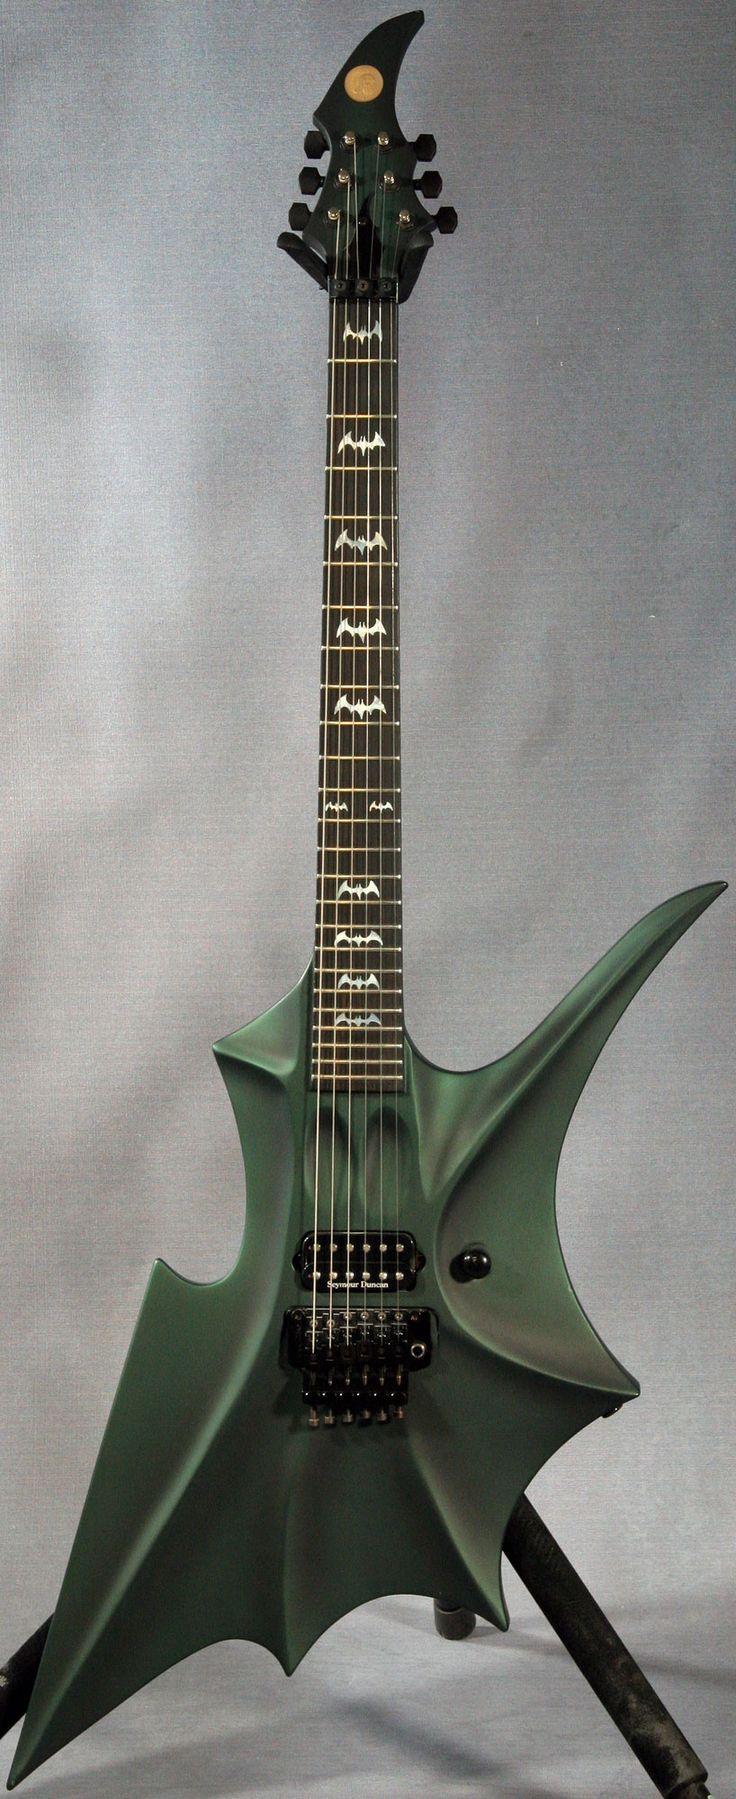 Dovetail template printable guitar - Ed Roman Abstract Rockingbat Guitar If Batman Played Guitar This Would Be It